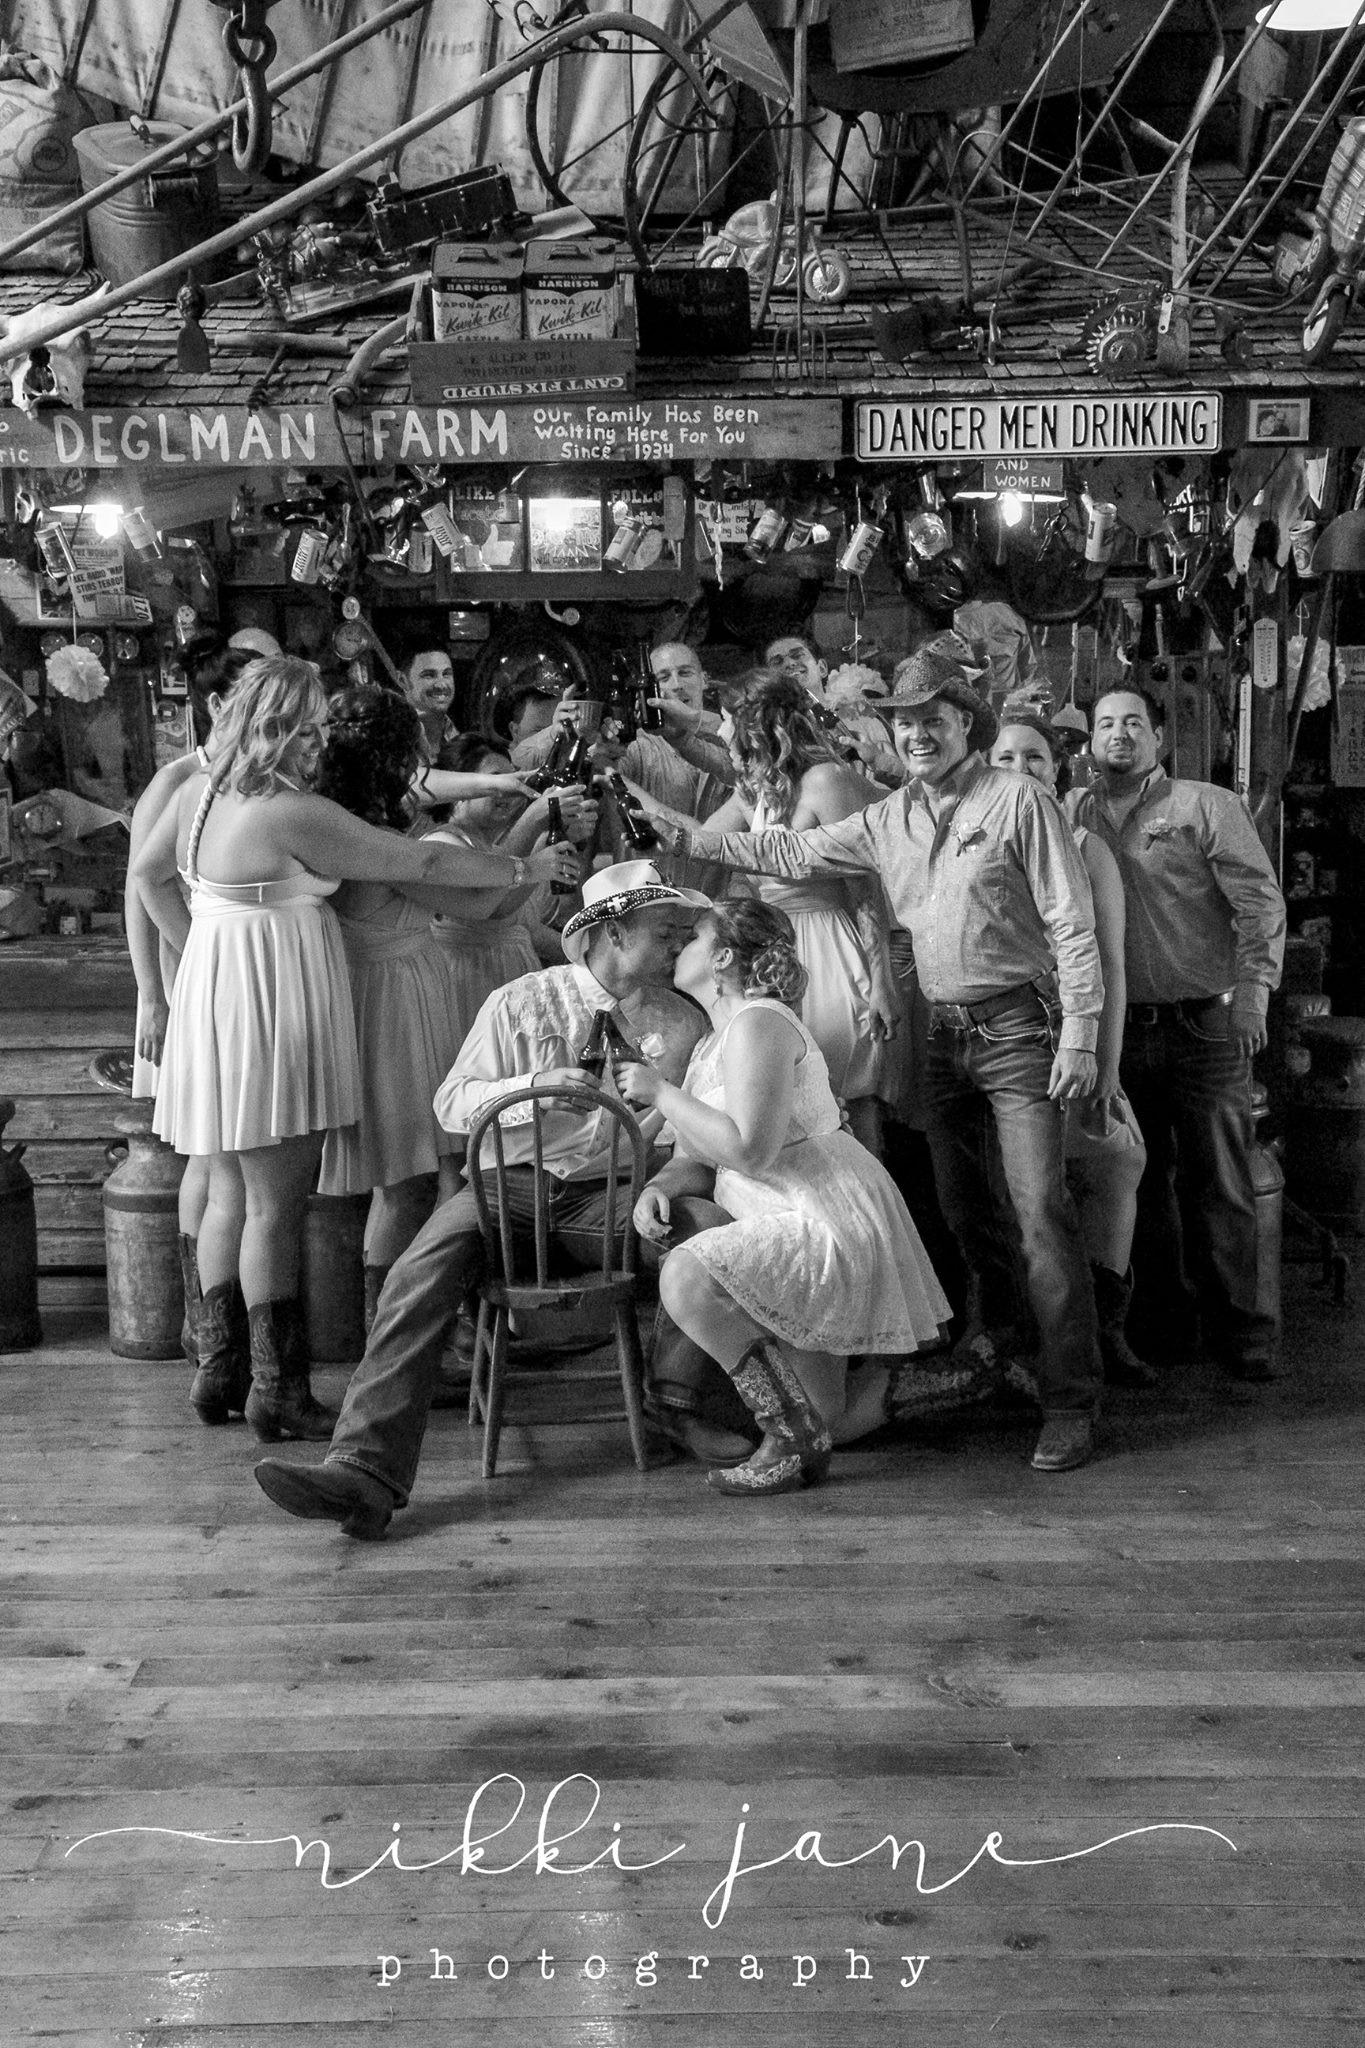 The Historic Deglman Farm image 2